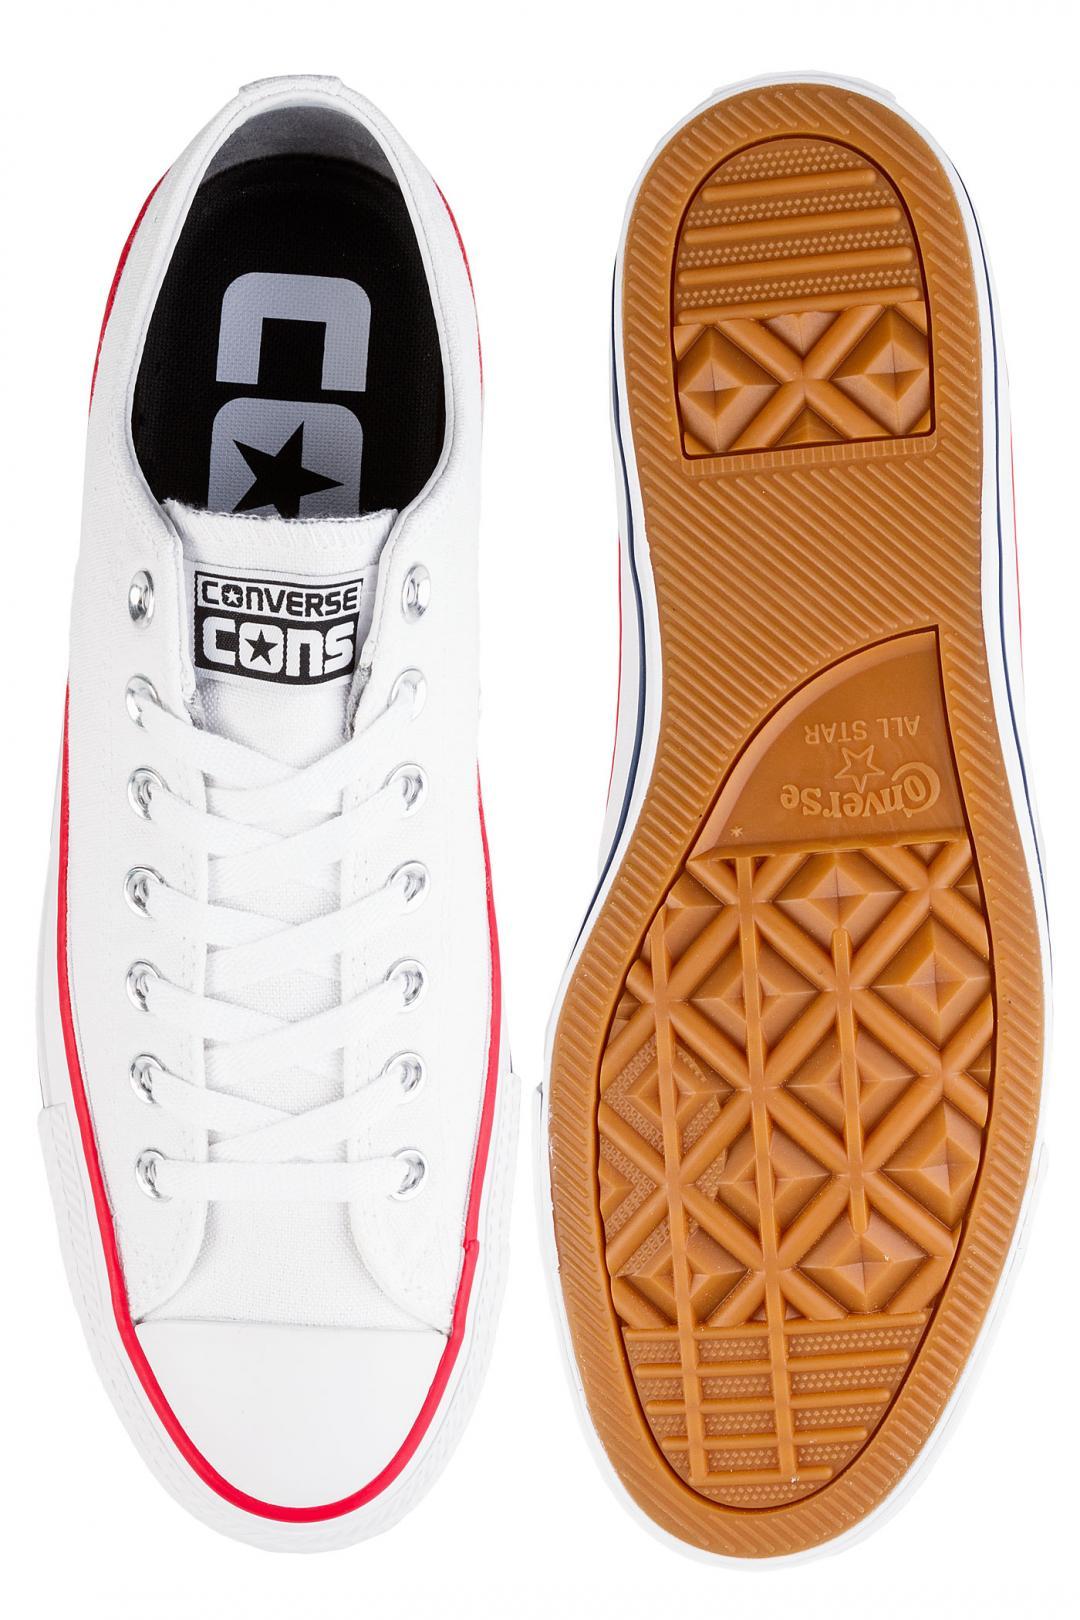 Uomo Converse CONS Chuck Taylor All Star Pro Ox white red insignia blue   Sneaker